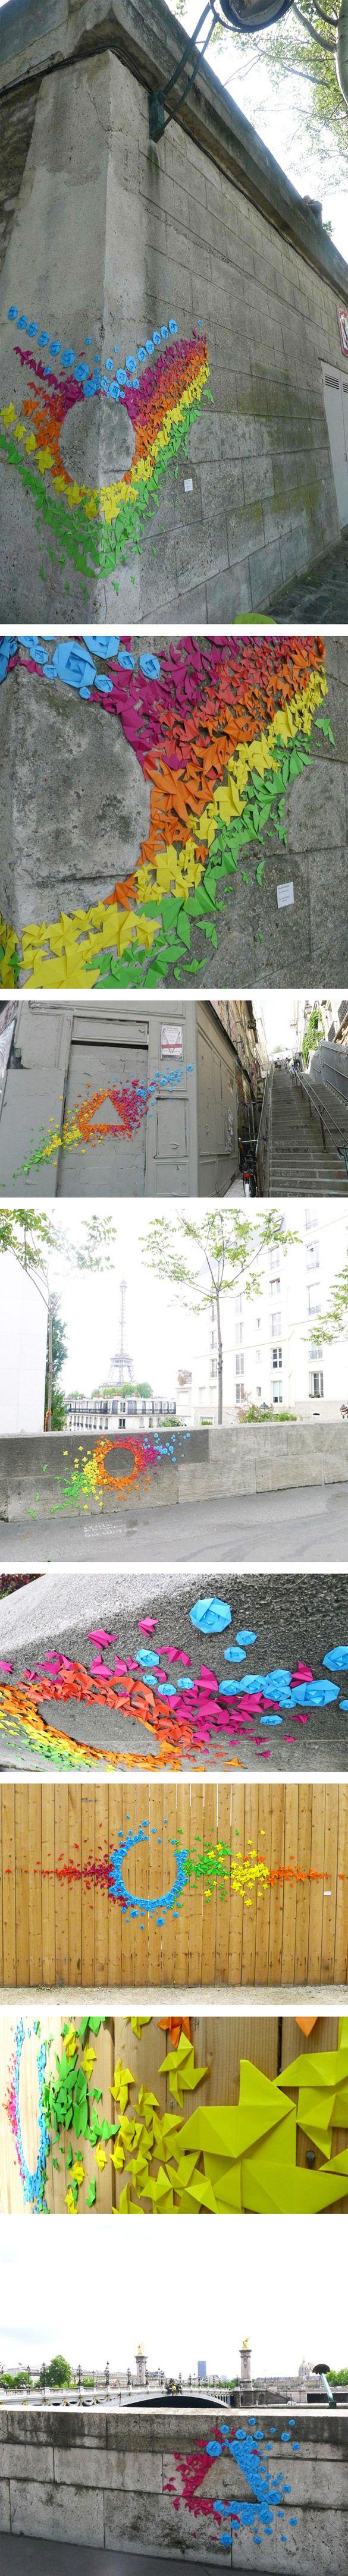 Street Art ::: Origami graffitis in Paris signed Mademoiselle Maurice